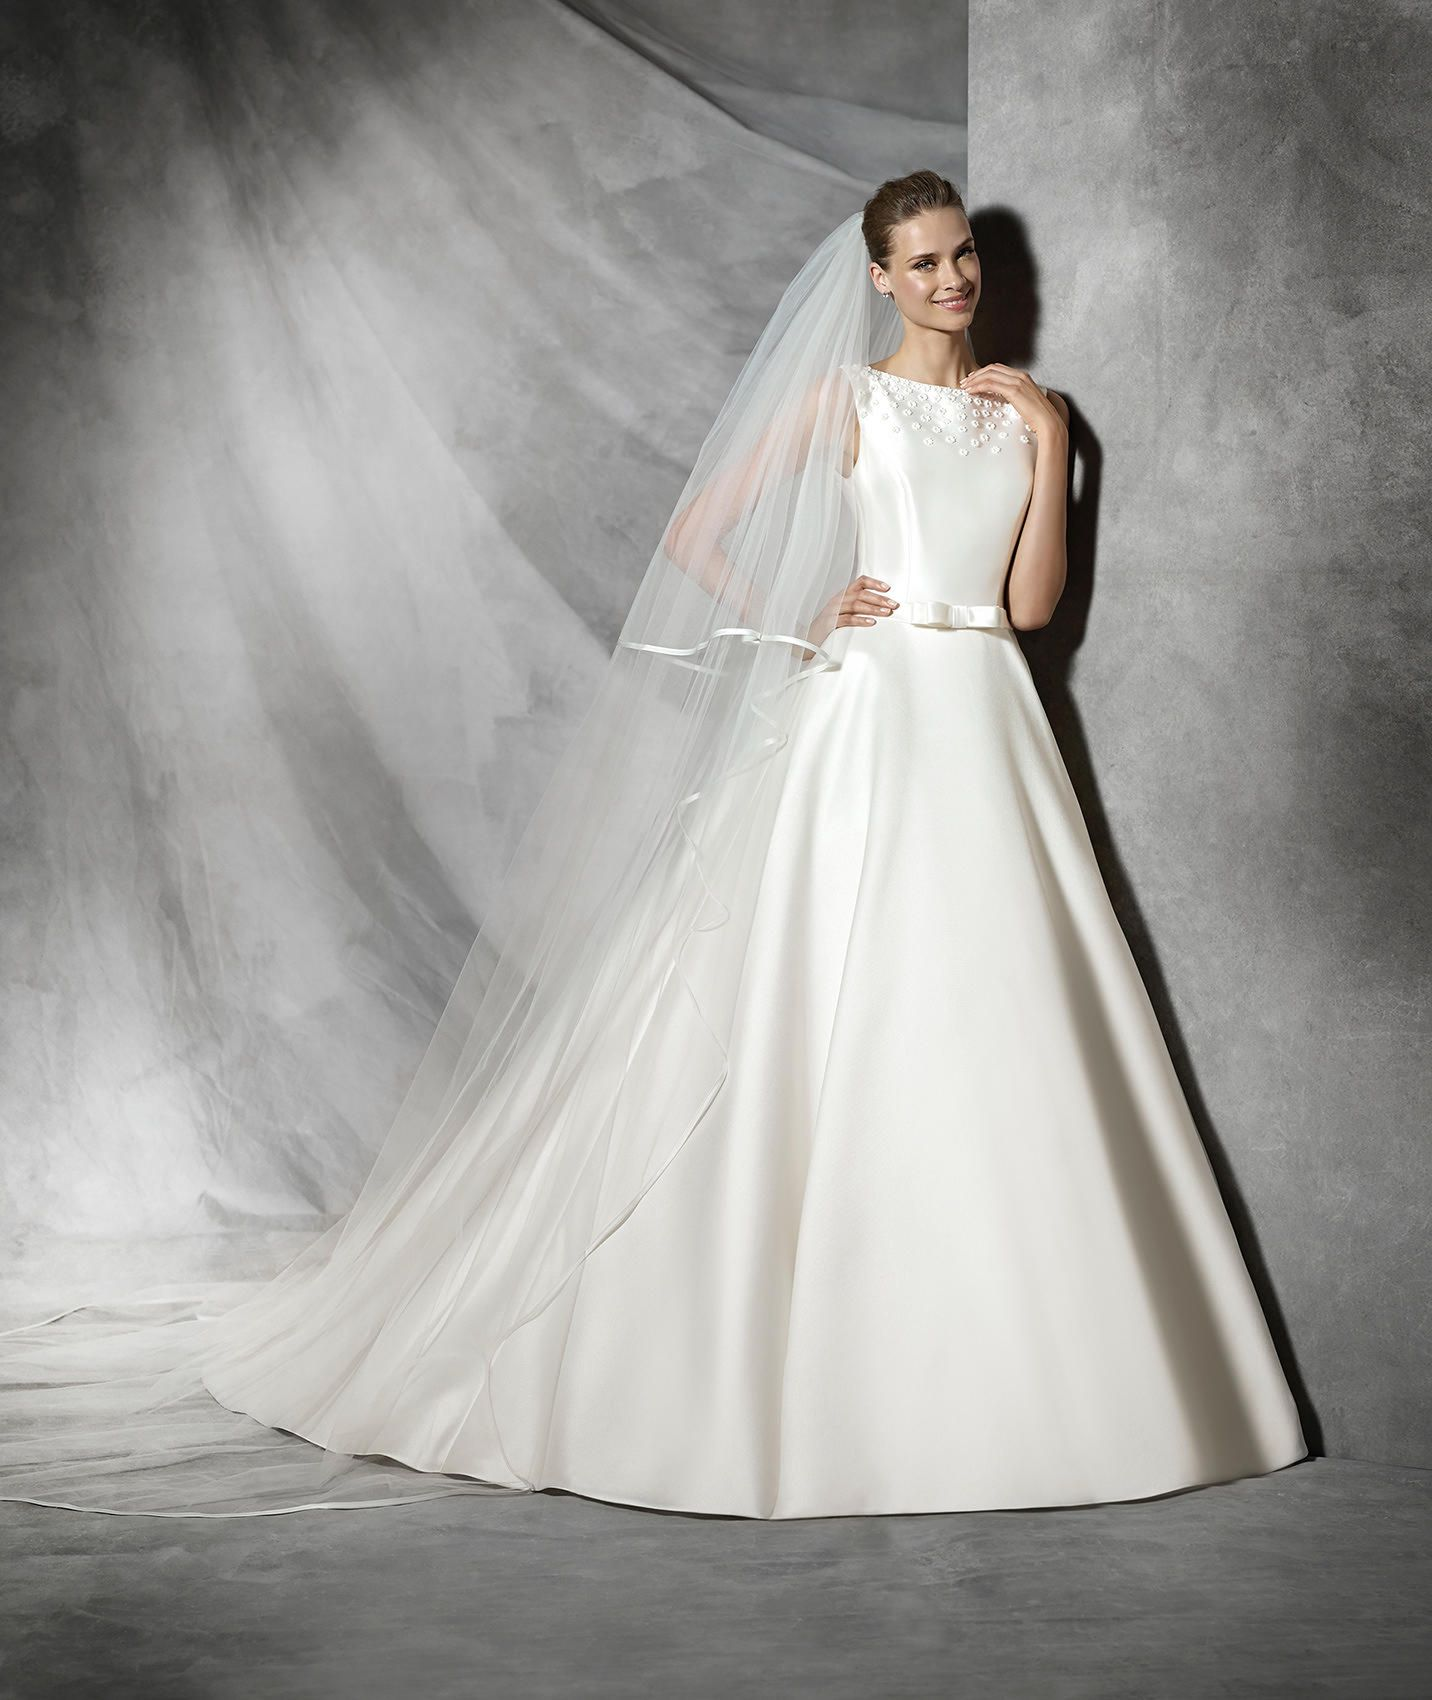 20 Chic 1950s Inspired Wedding Dresses | 1950s, Wedding and Wedding ...